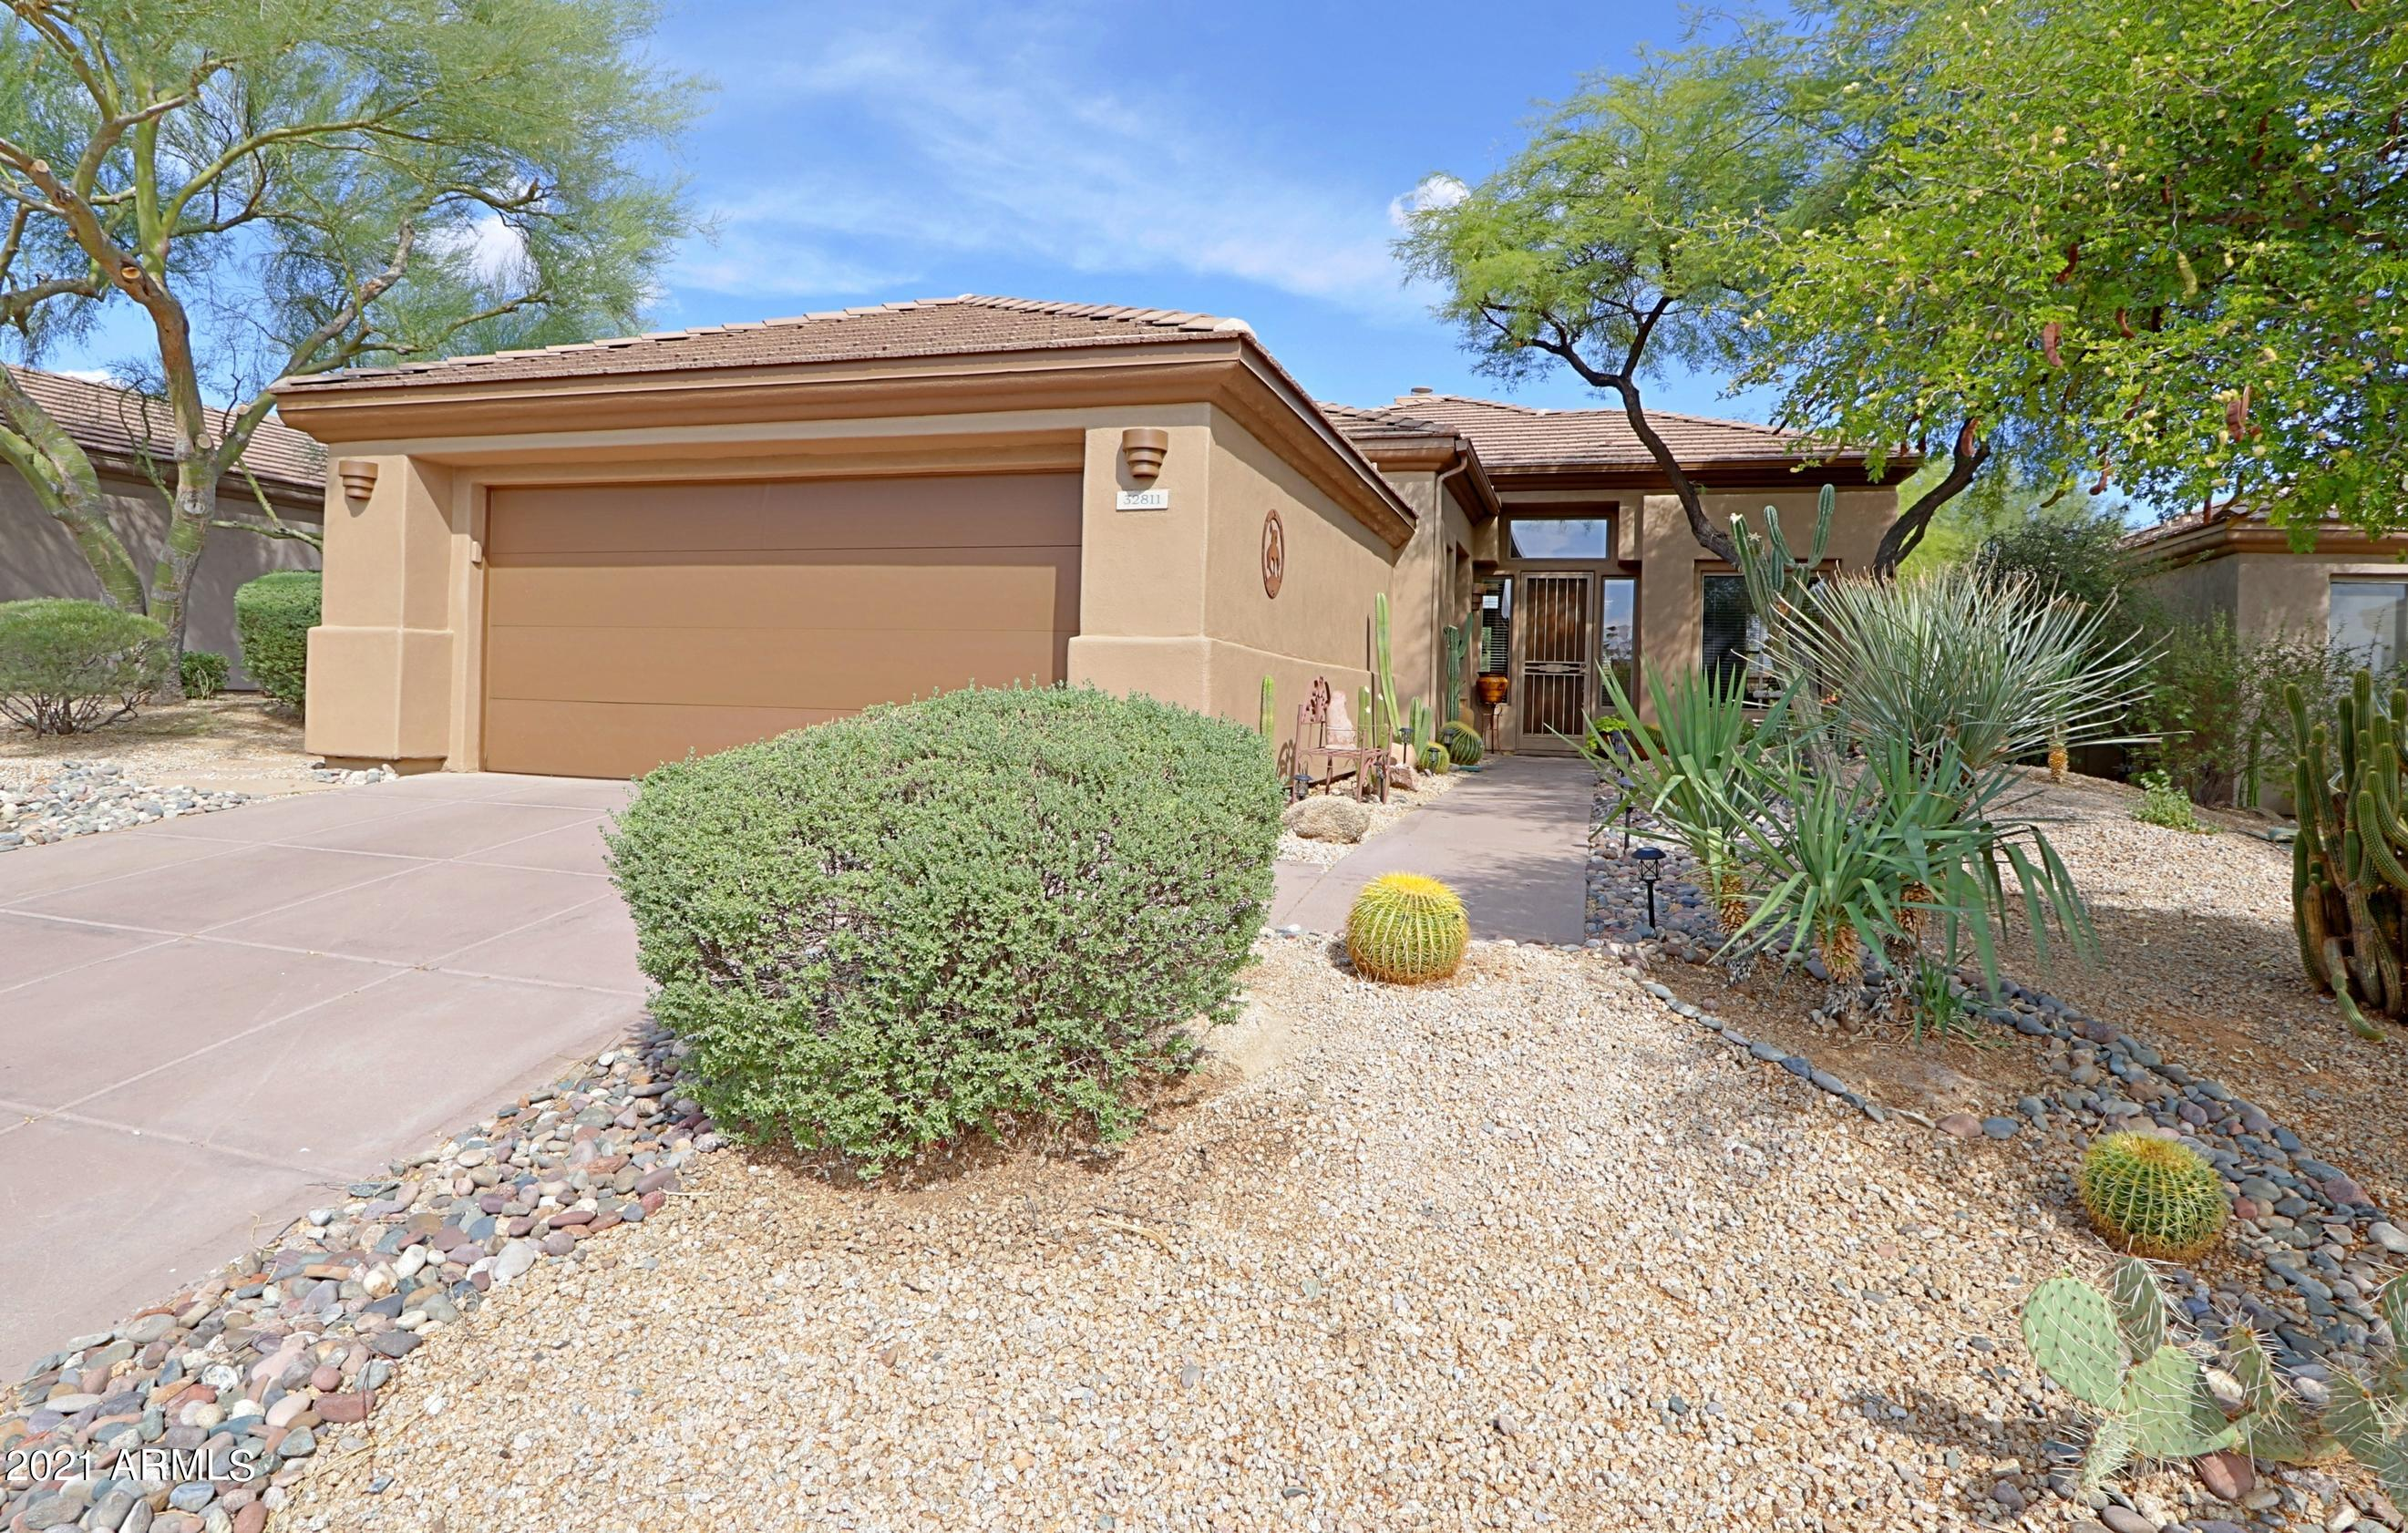 32811 N 70th Street, Scottsdale AZ 85266 - Photo 1